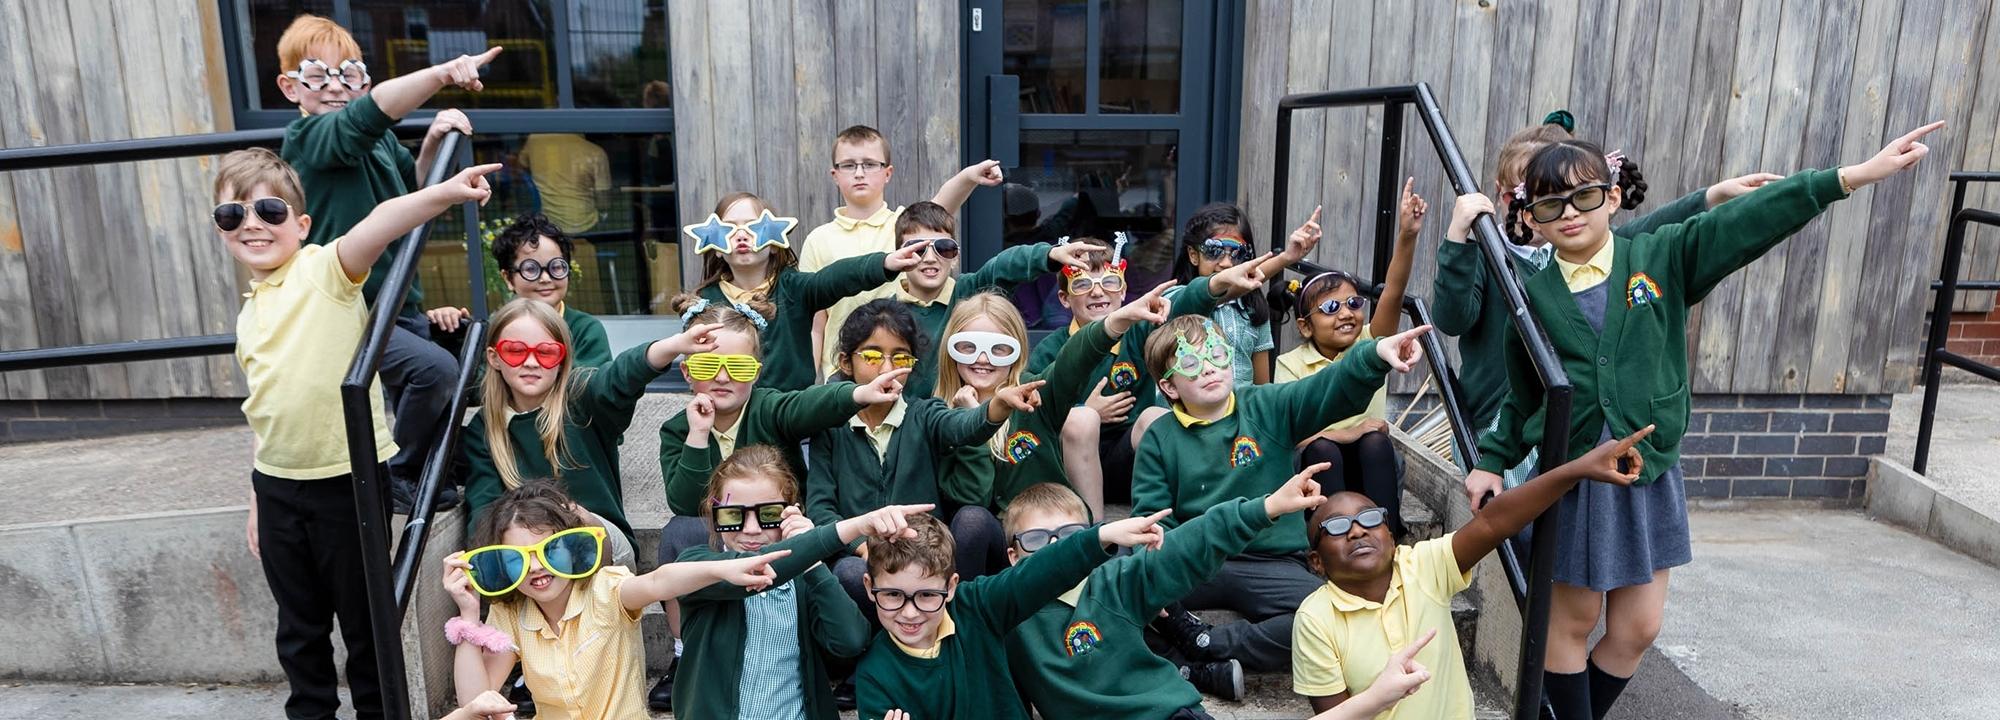 Hazel Grove Primary School - Contact Us page image